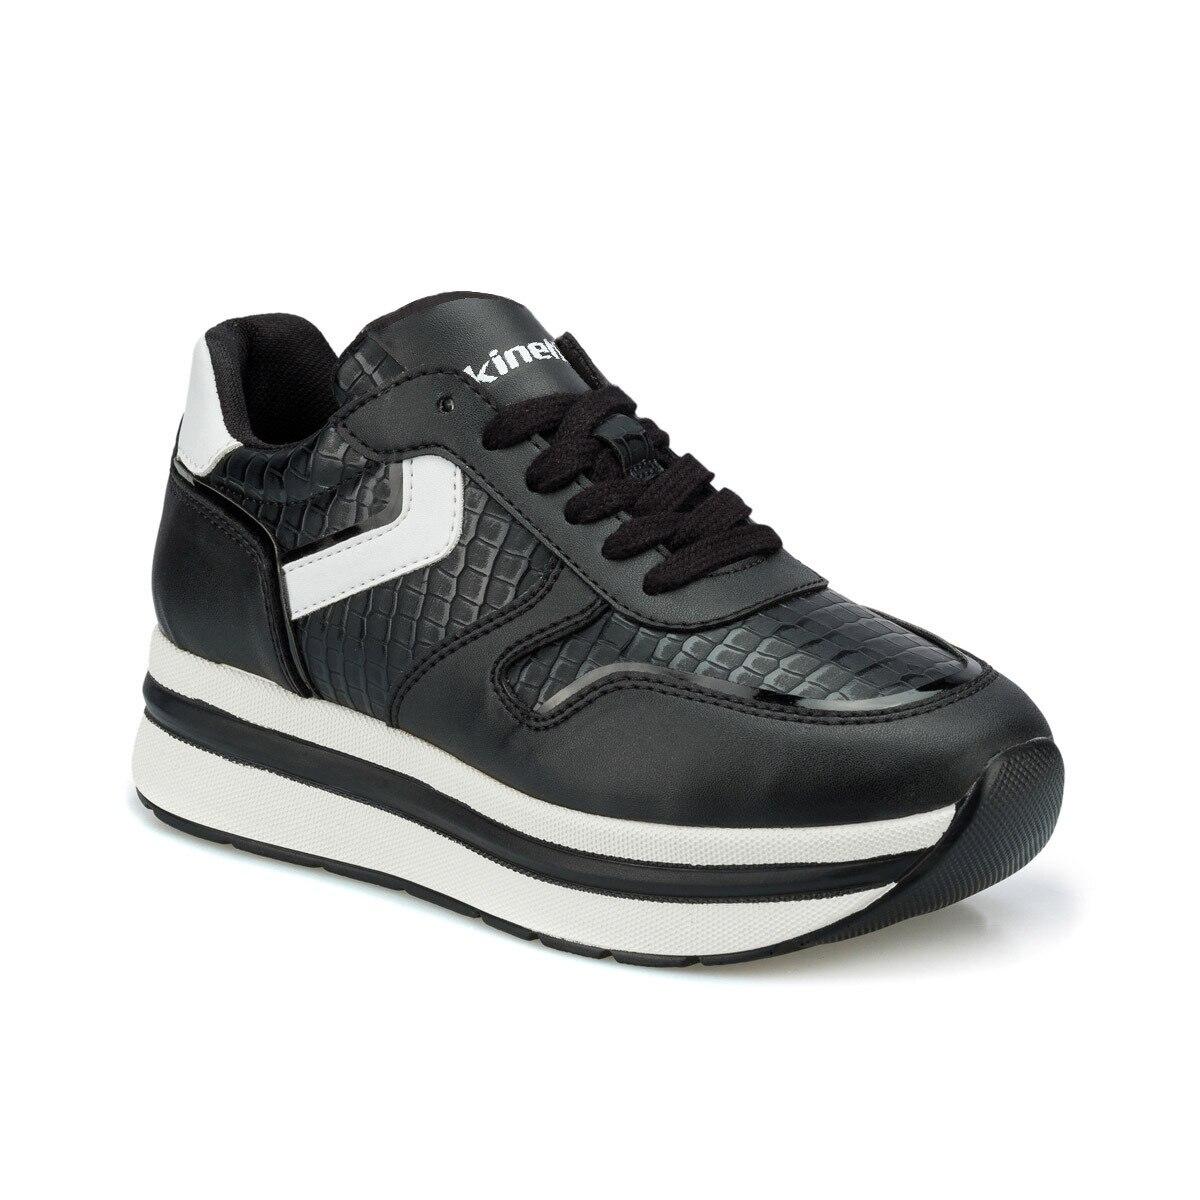 FLO MABEL Black Women 'S Sports Shoes KINETIX